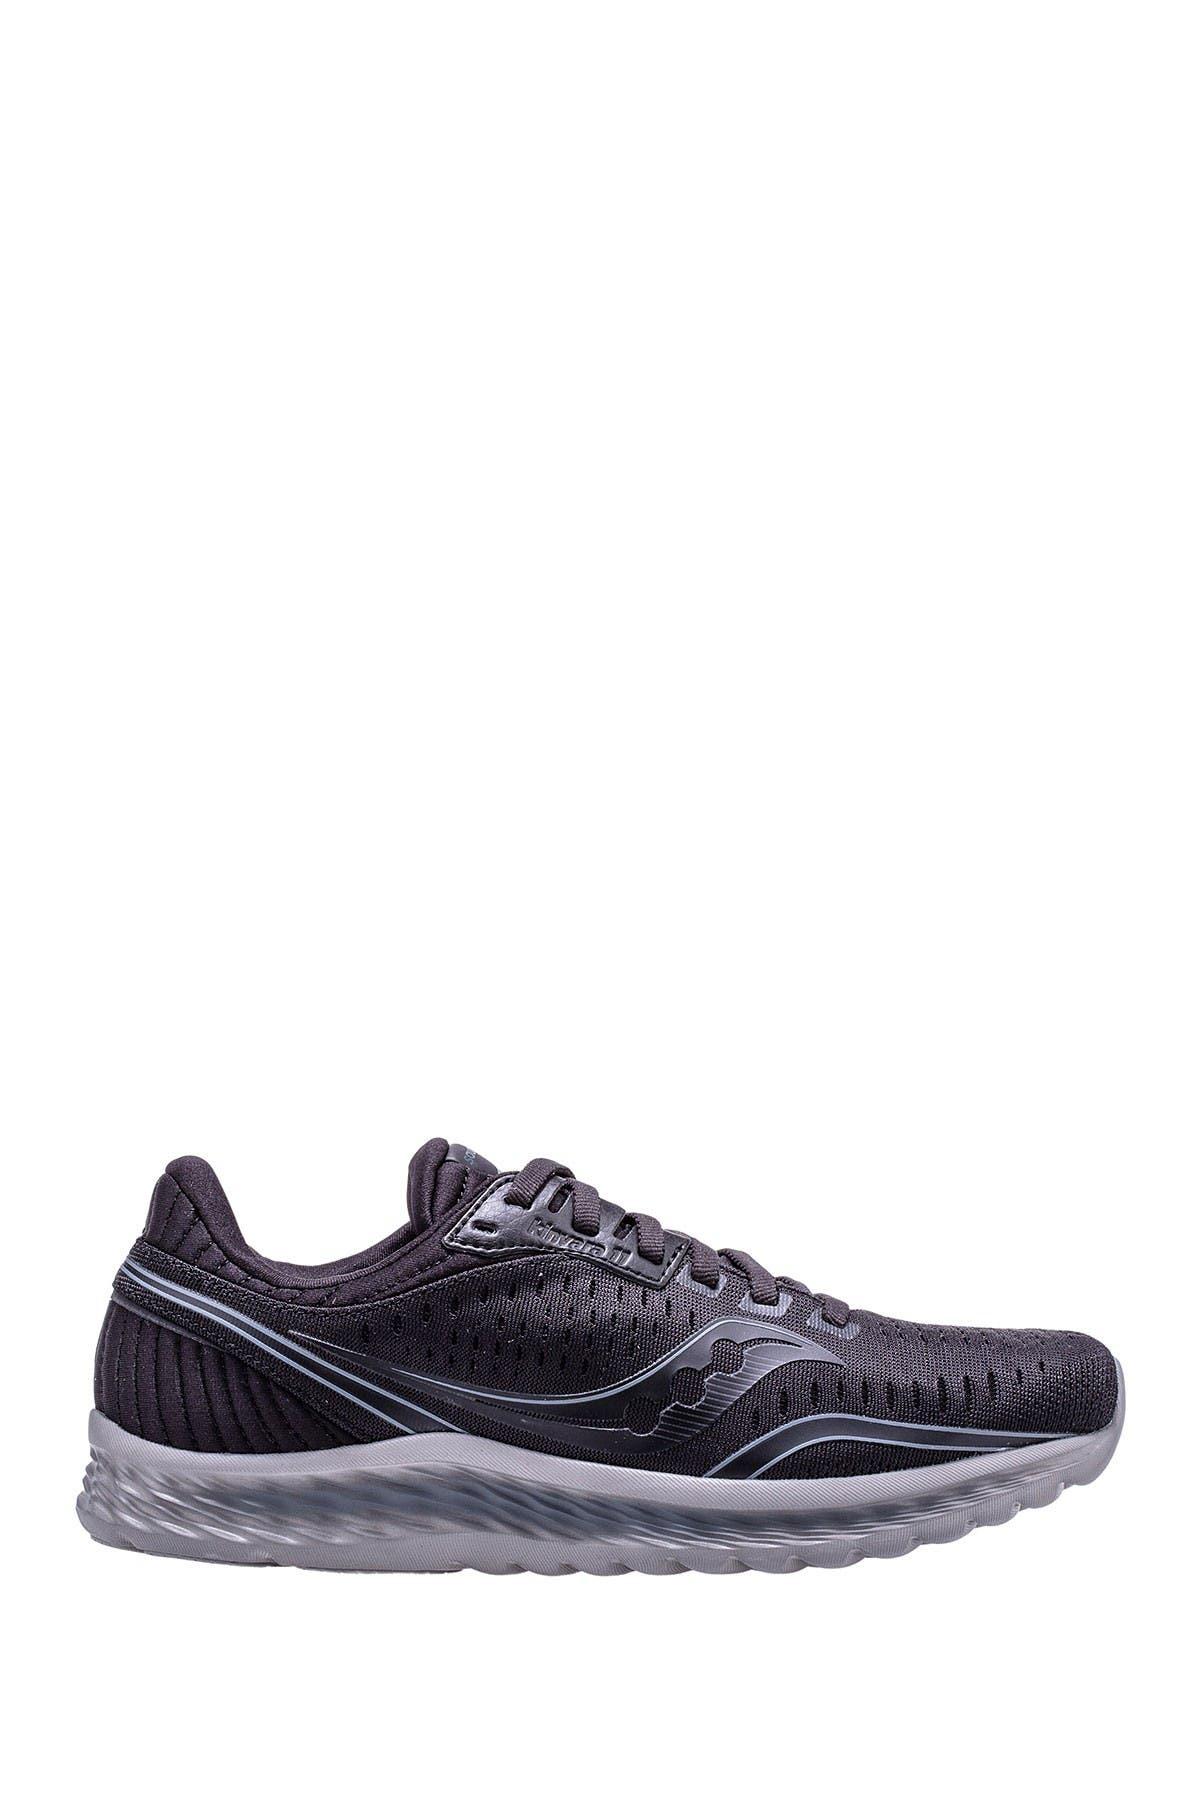 Image of Saucony Kinvara 11 Sneaker - Wide Width